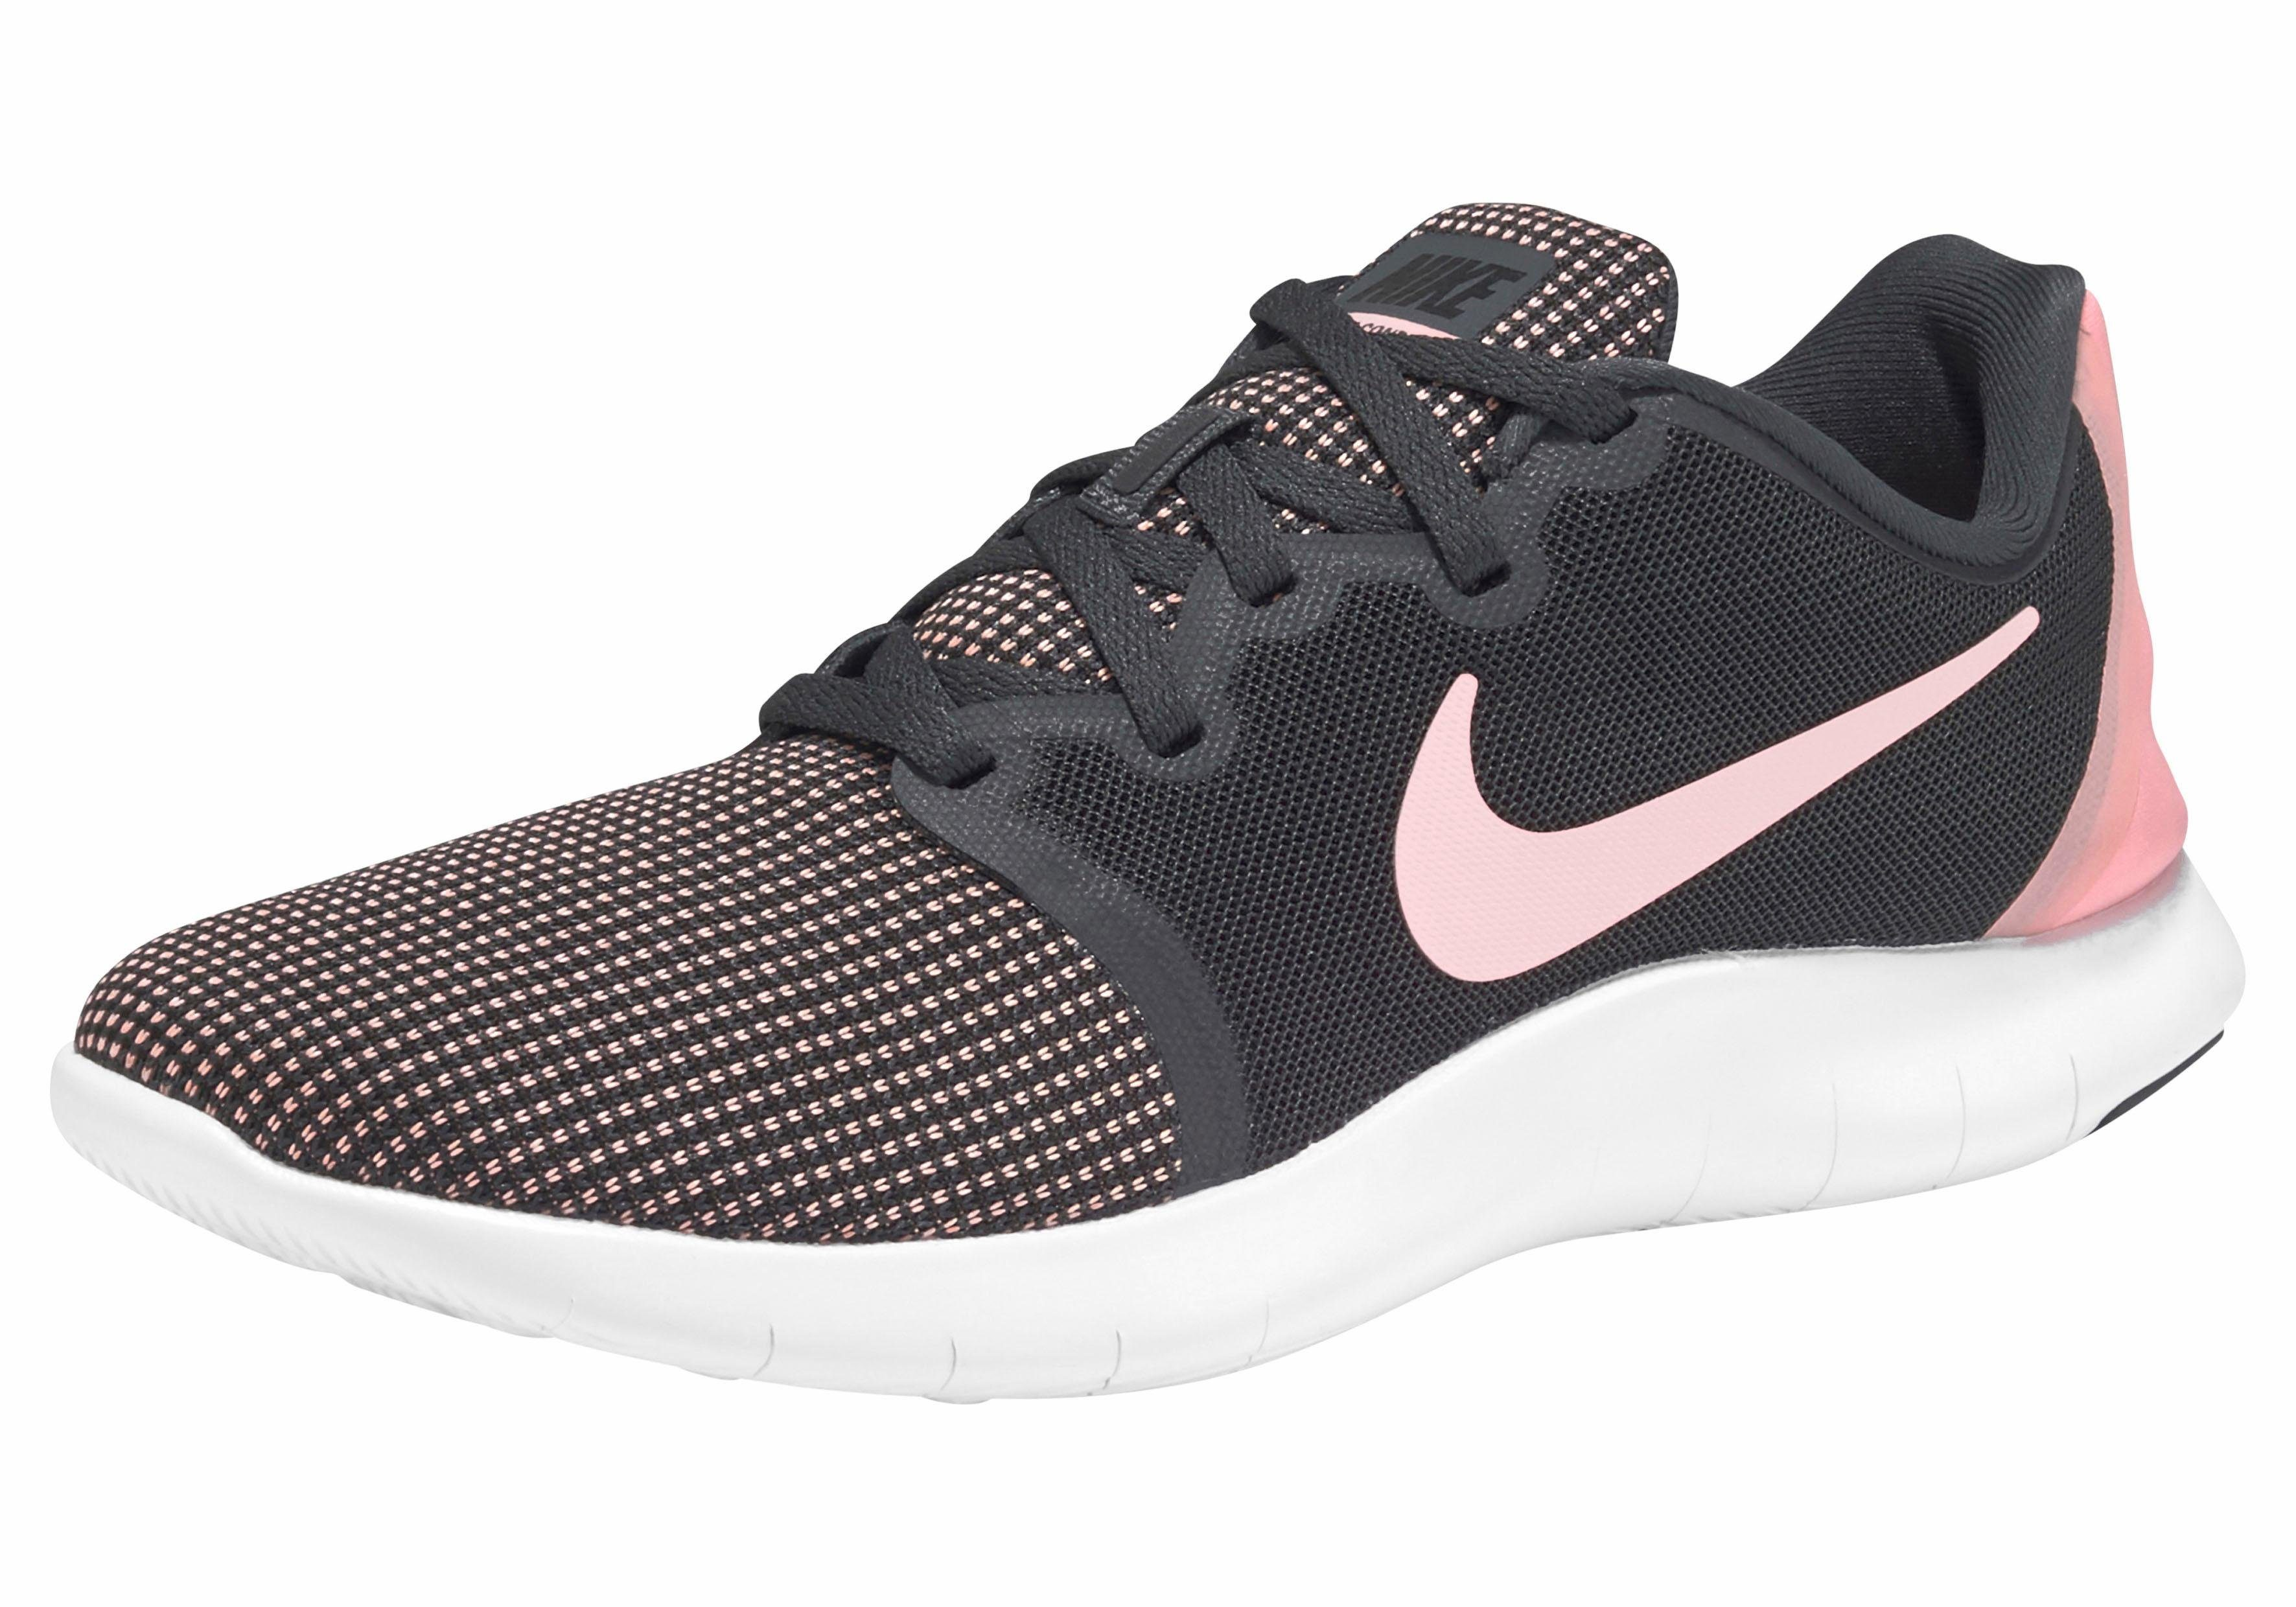 Nike Wmns Flex Contact 2 Laufschuh online kaufen  anthrazit-rosa